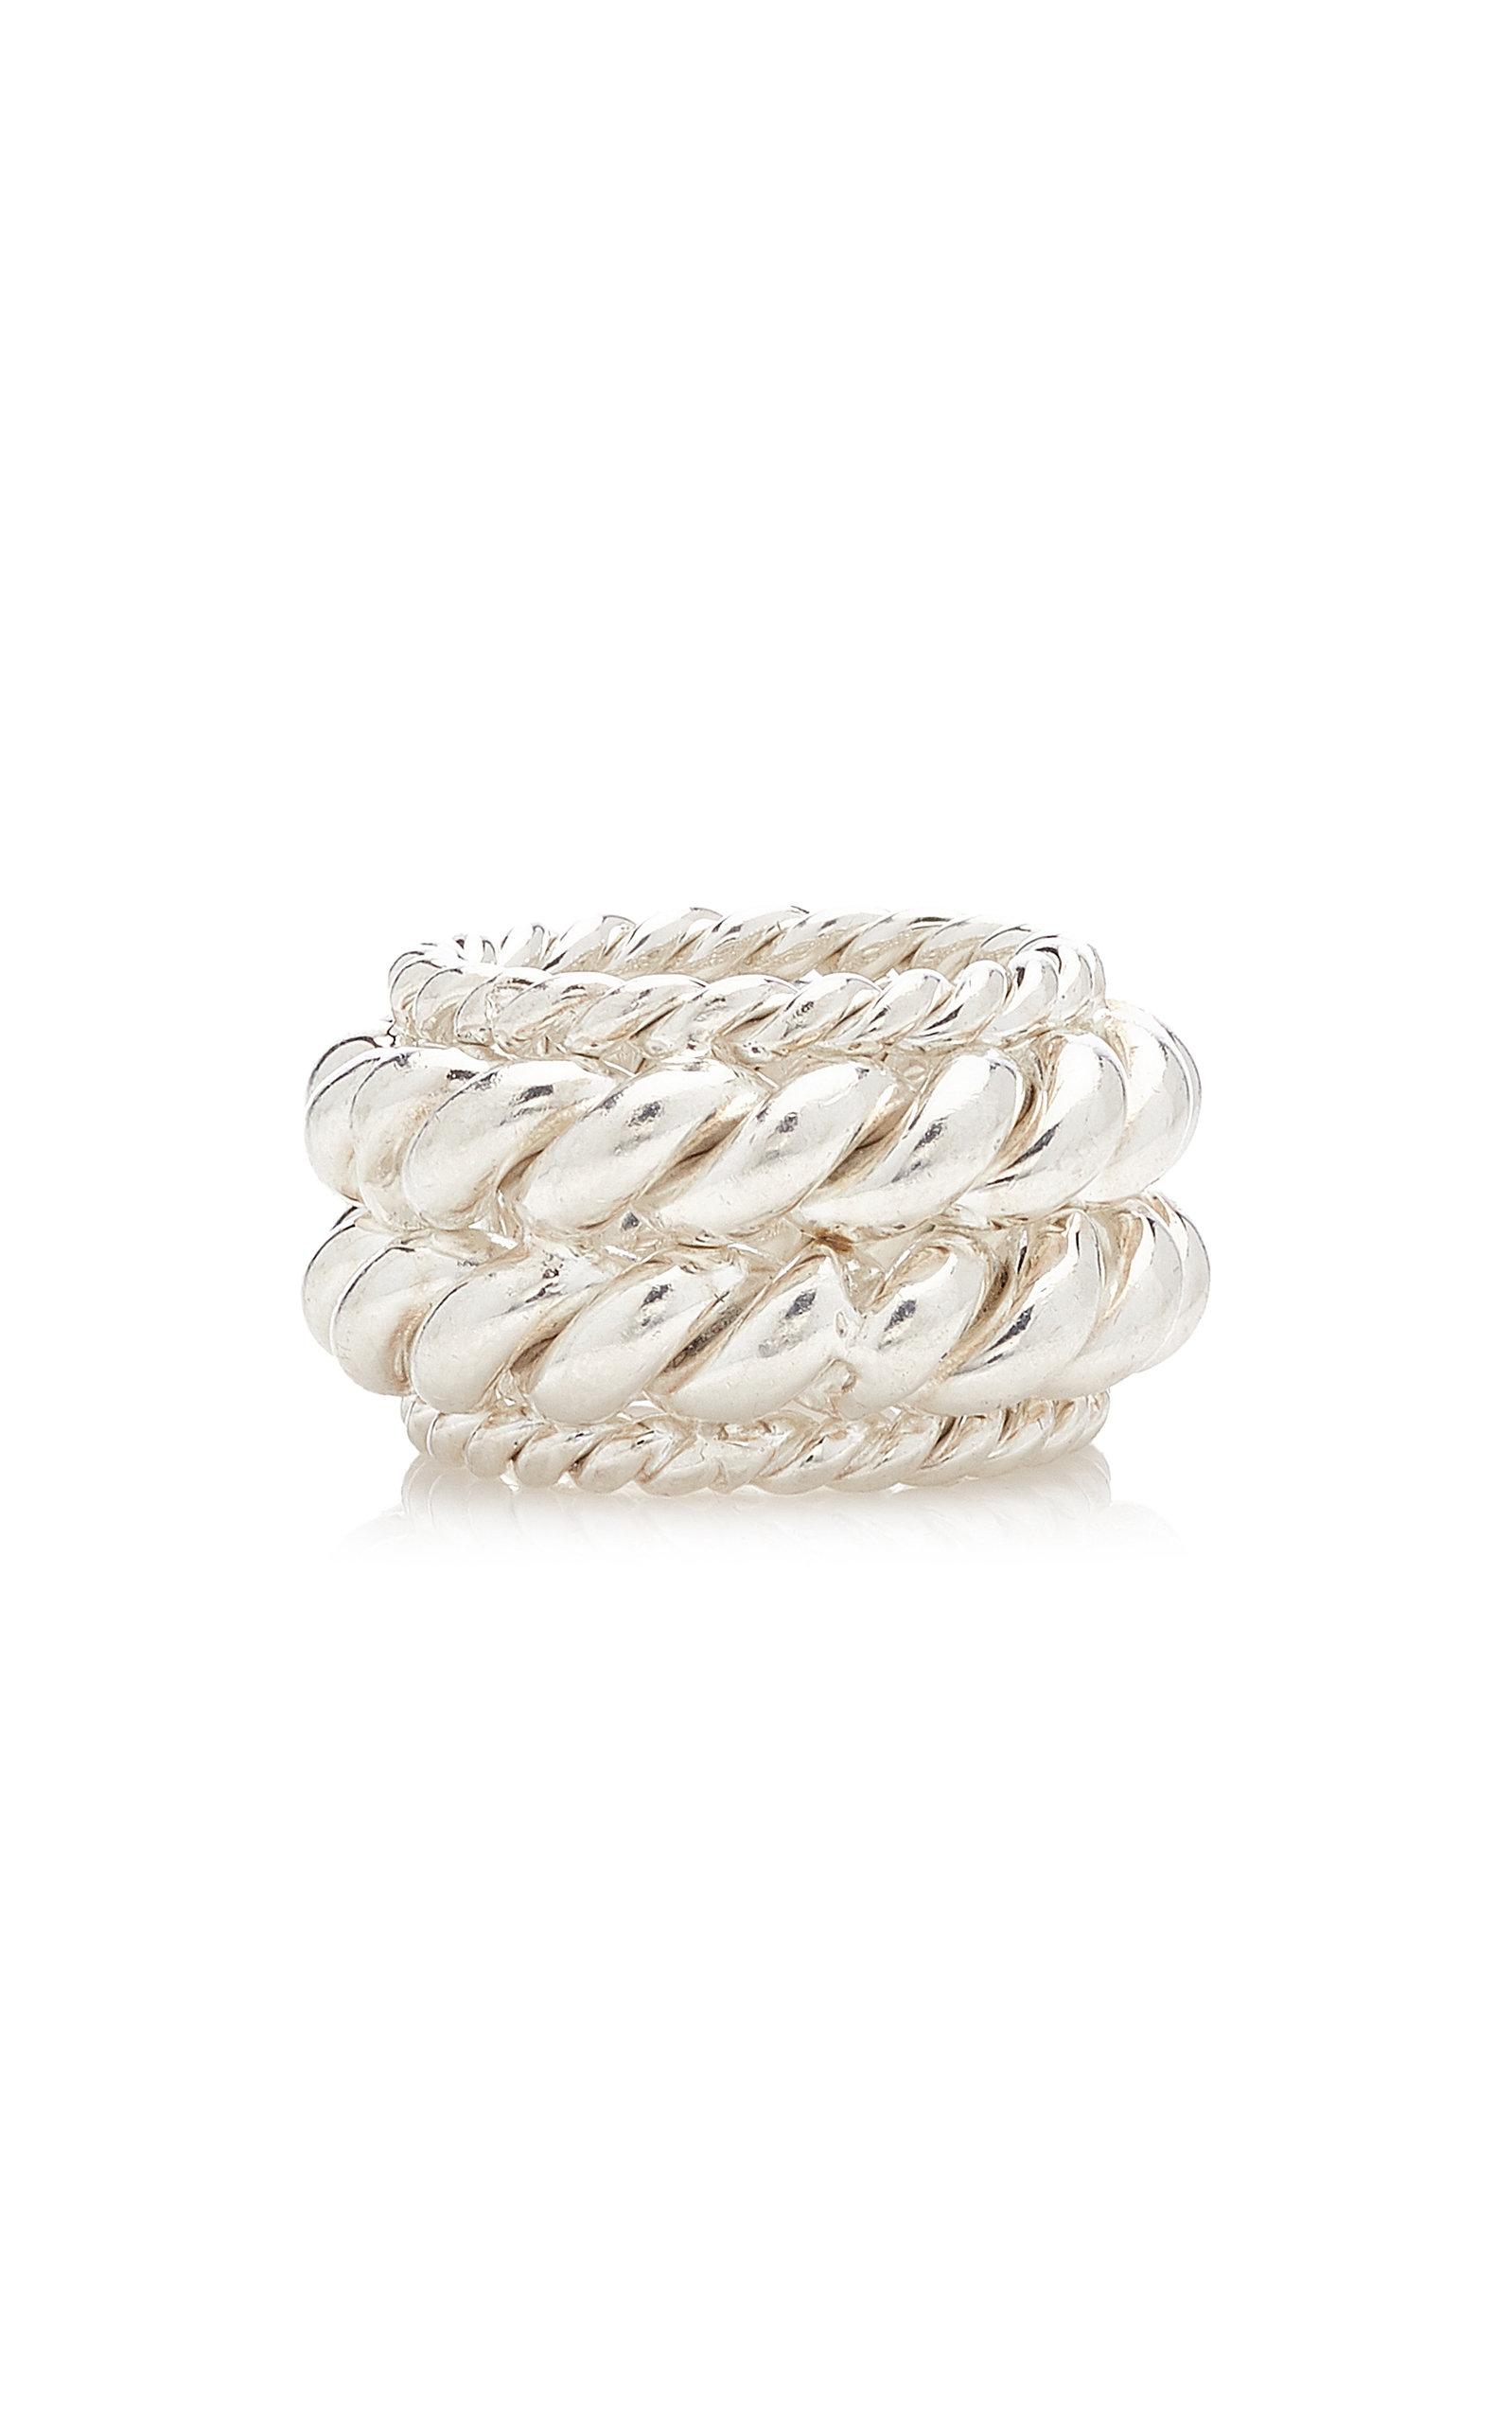 Isabel Lennse - Women's Twisted Spin Sterling Silver Ring - Silver - Moda Operandi